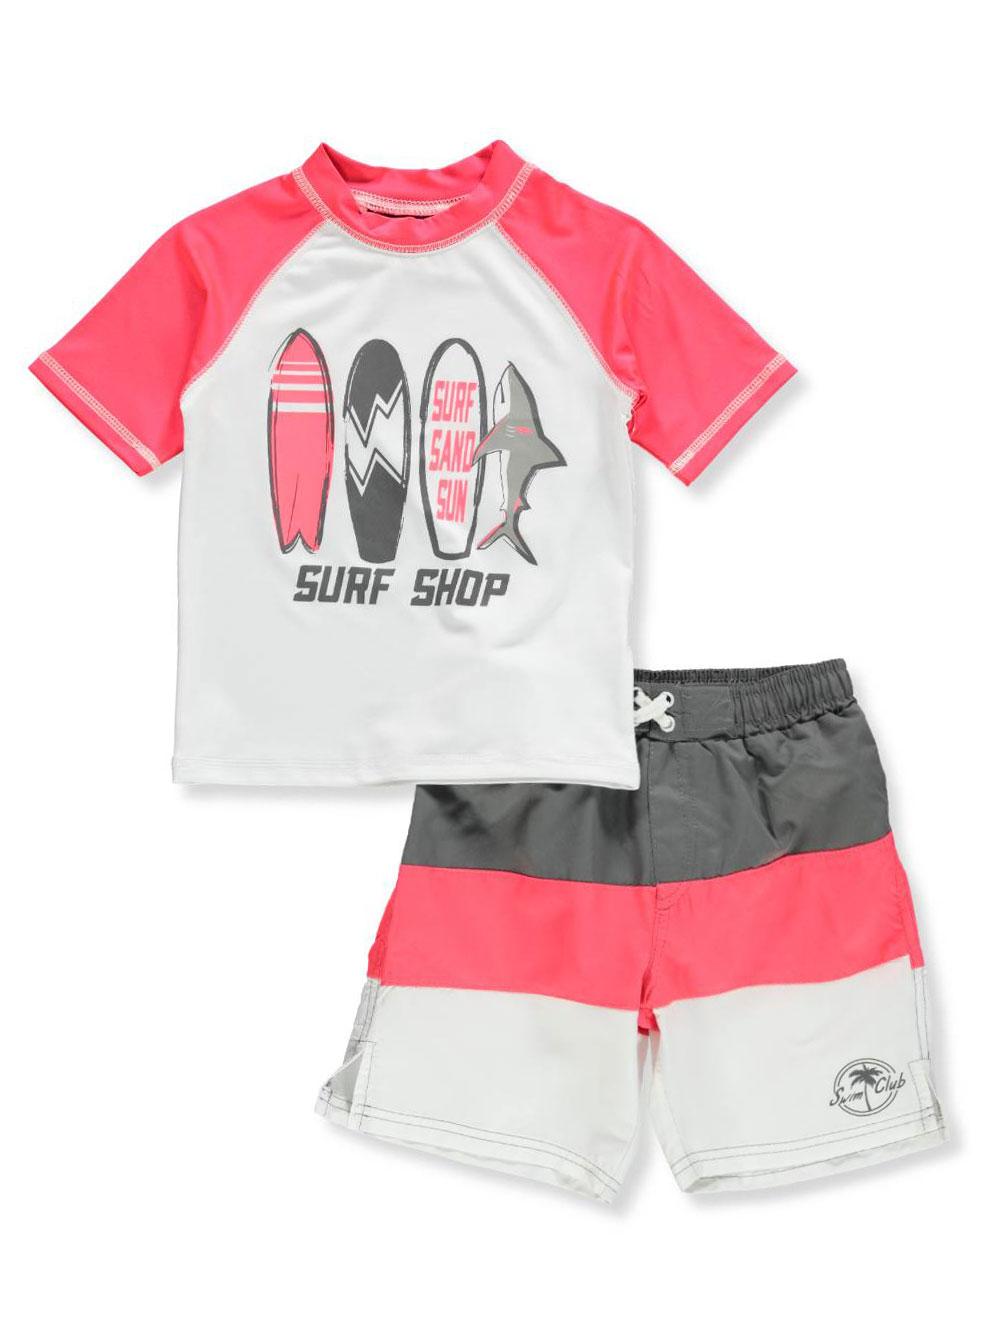 Trisharosew Kids Dolan Twins Music Band Boys Girls Sweatpants Sport Fleece Jogger Back Pocket Black